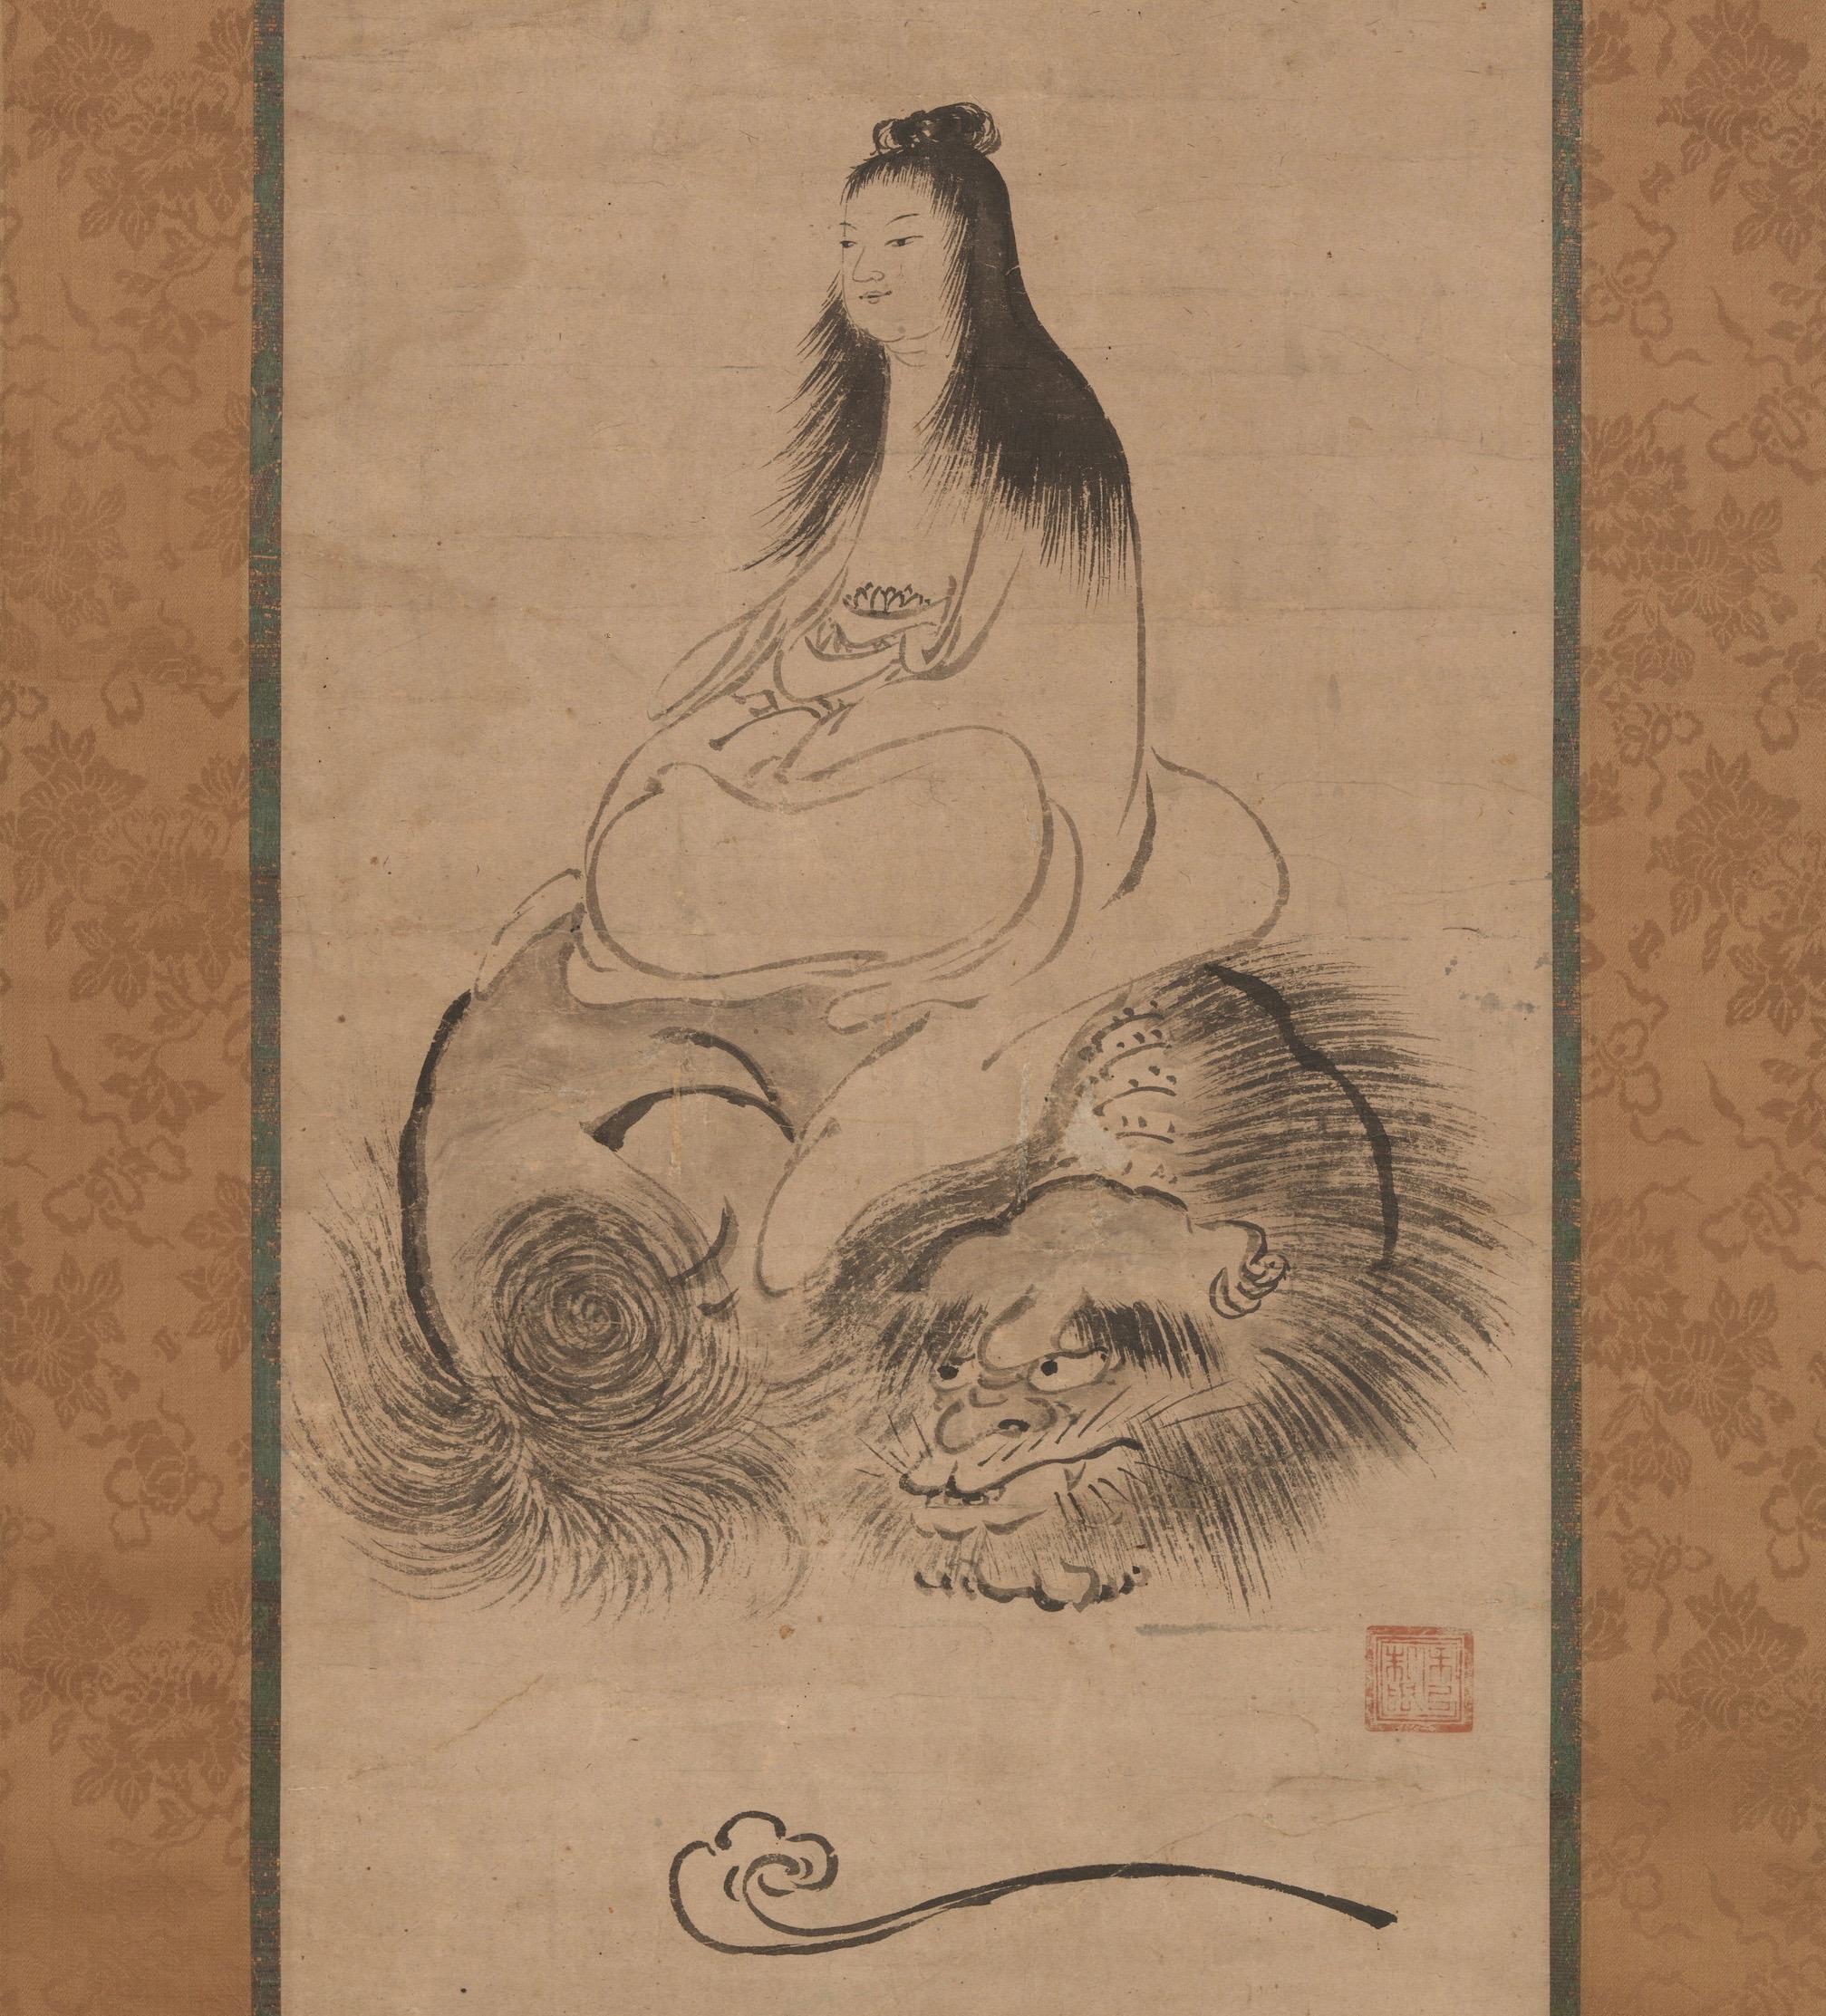 Monju (Manjusri) on a Lion. Shuusei. Late 15th century. Muromachi period. Japan. Image courtesy of  The Met .